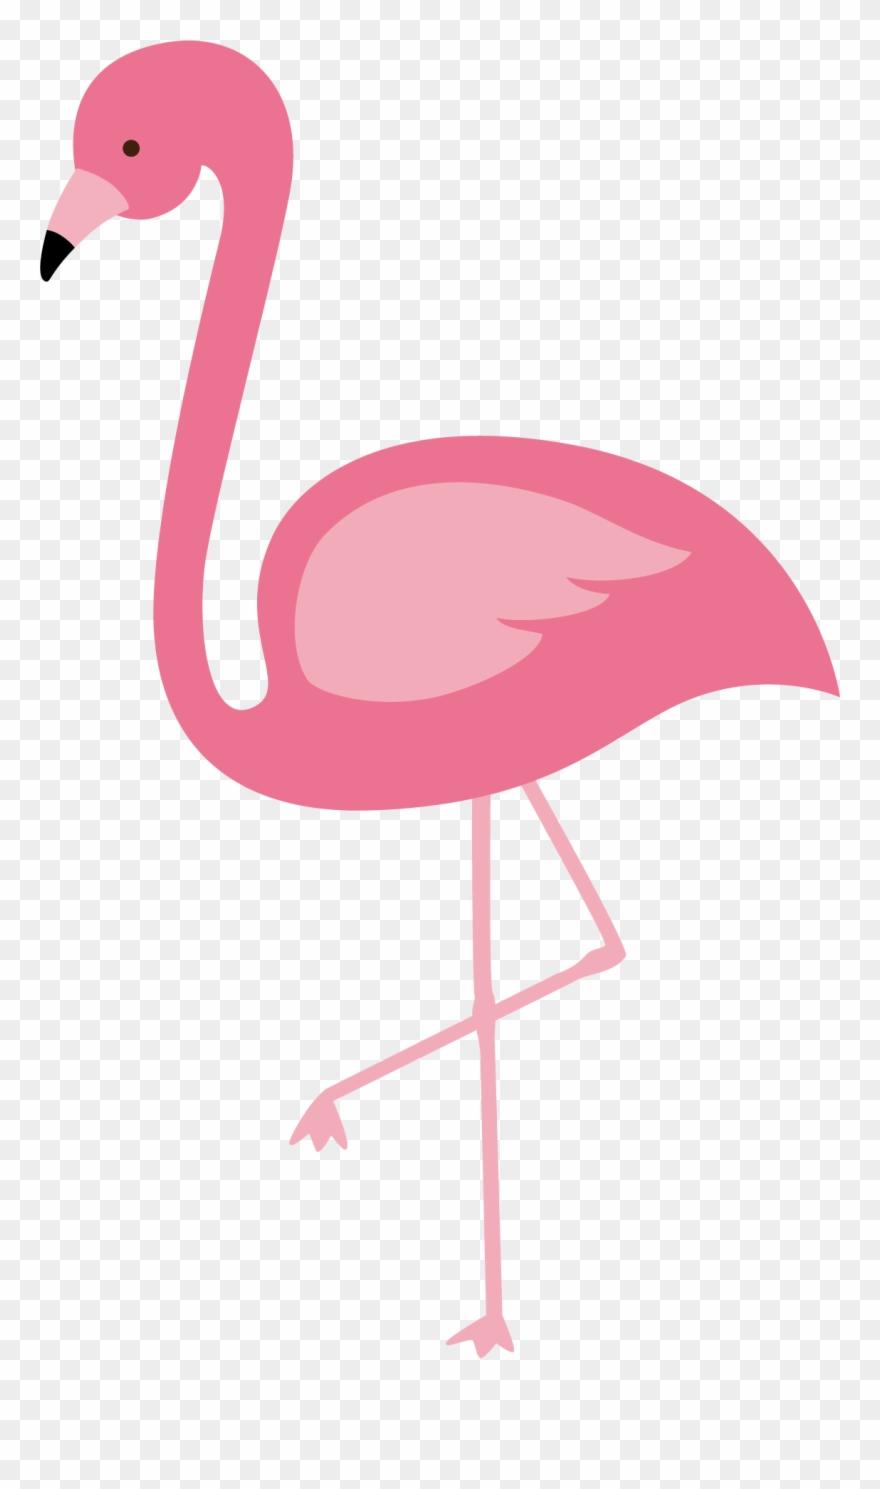 Flamingo clipart transparent background clip art transparent download Flamingo Clipart Pink Flamingo - Vector Flamingo Png Transparent Png ... clip art transparent download